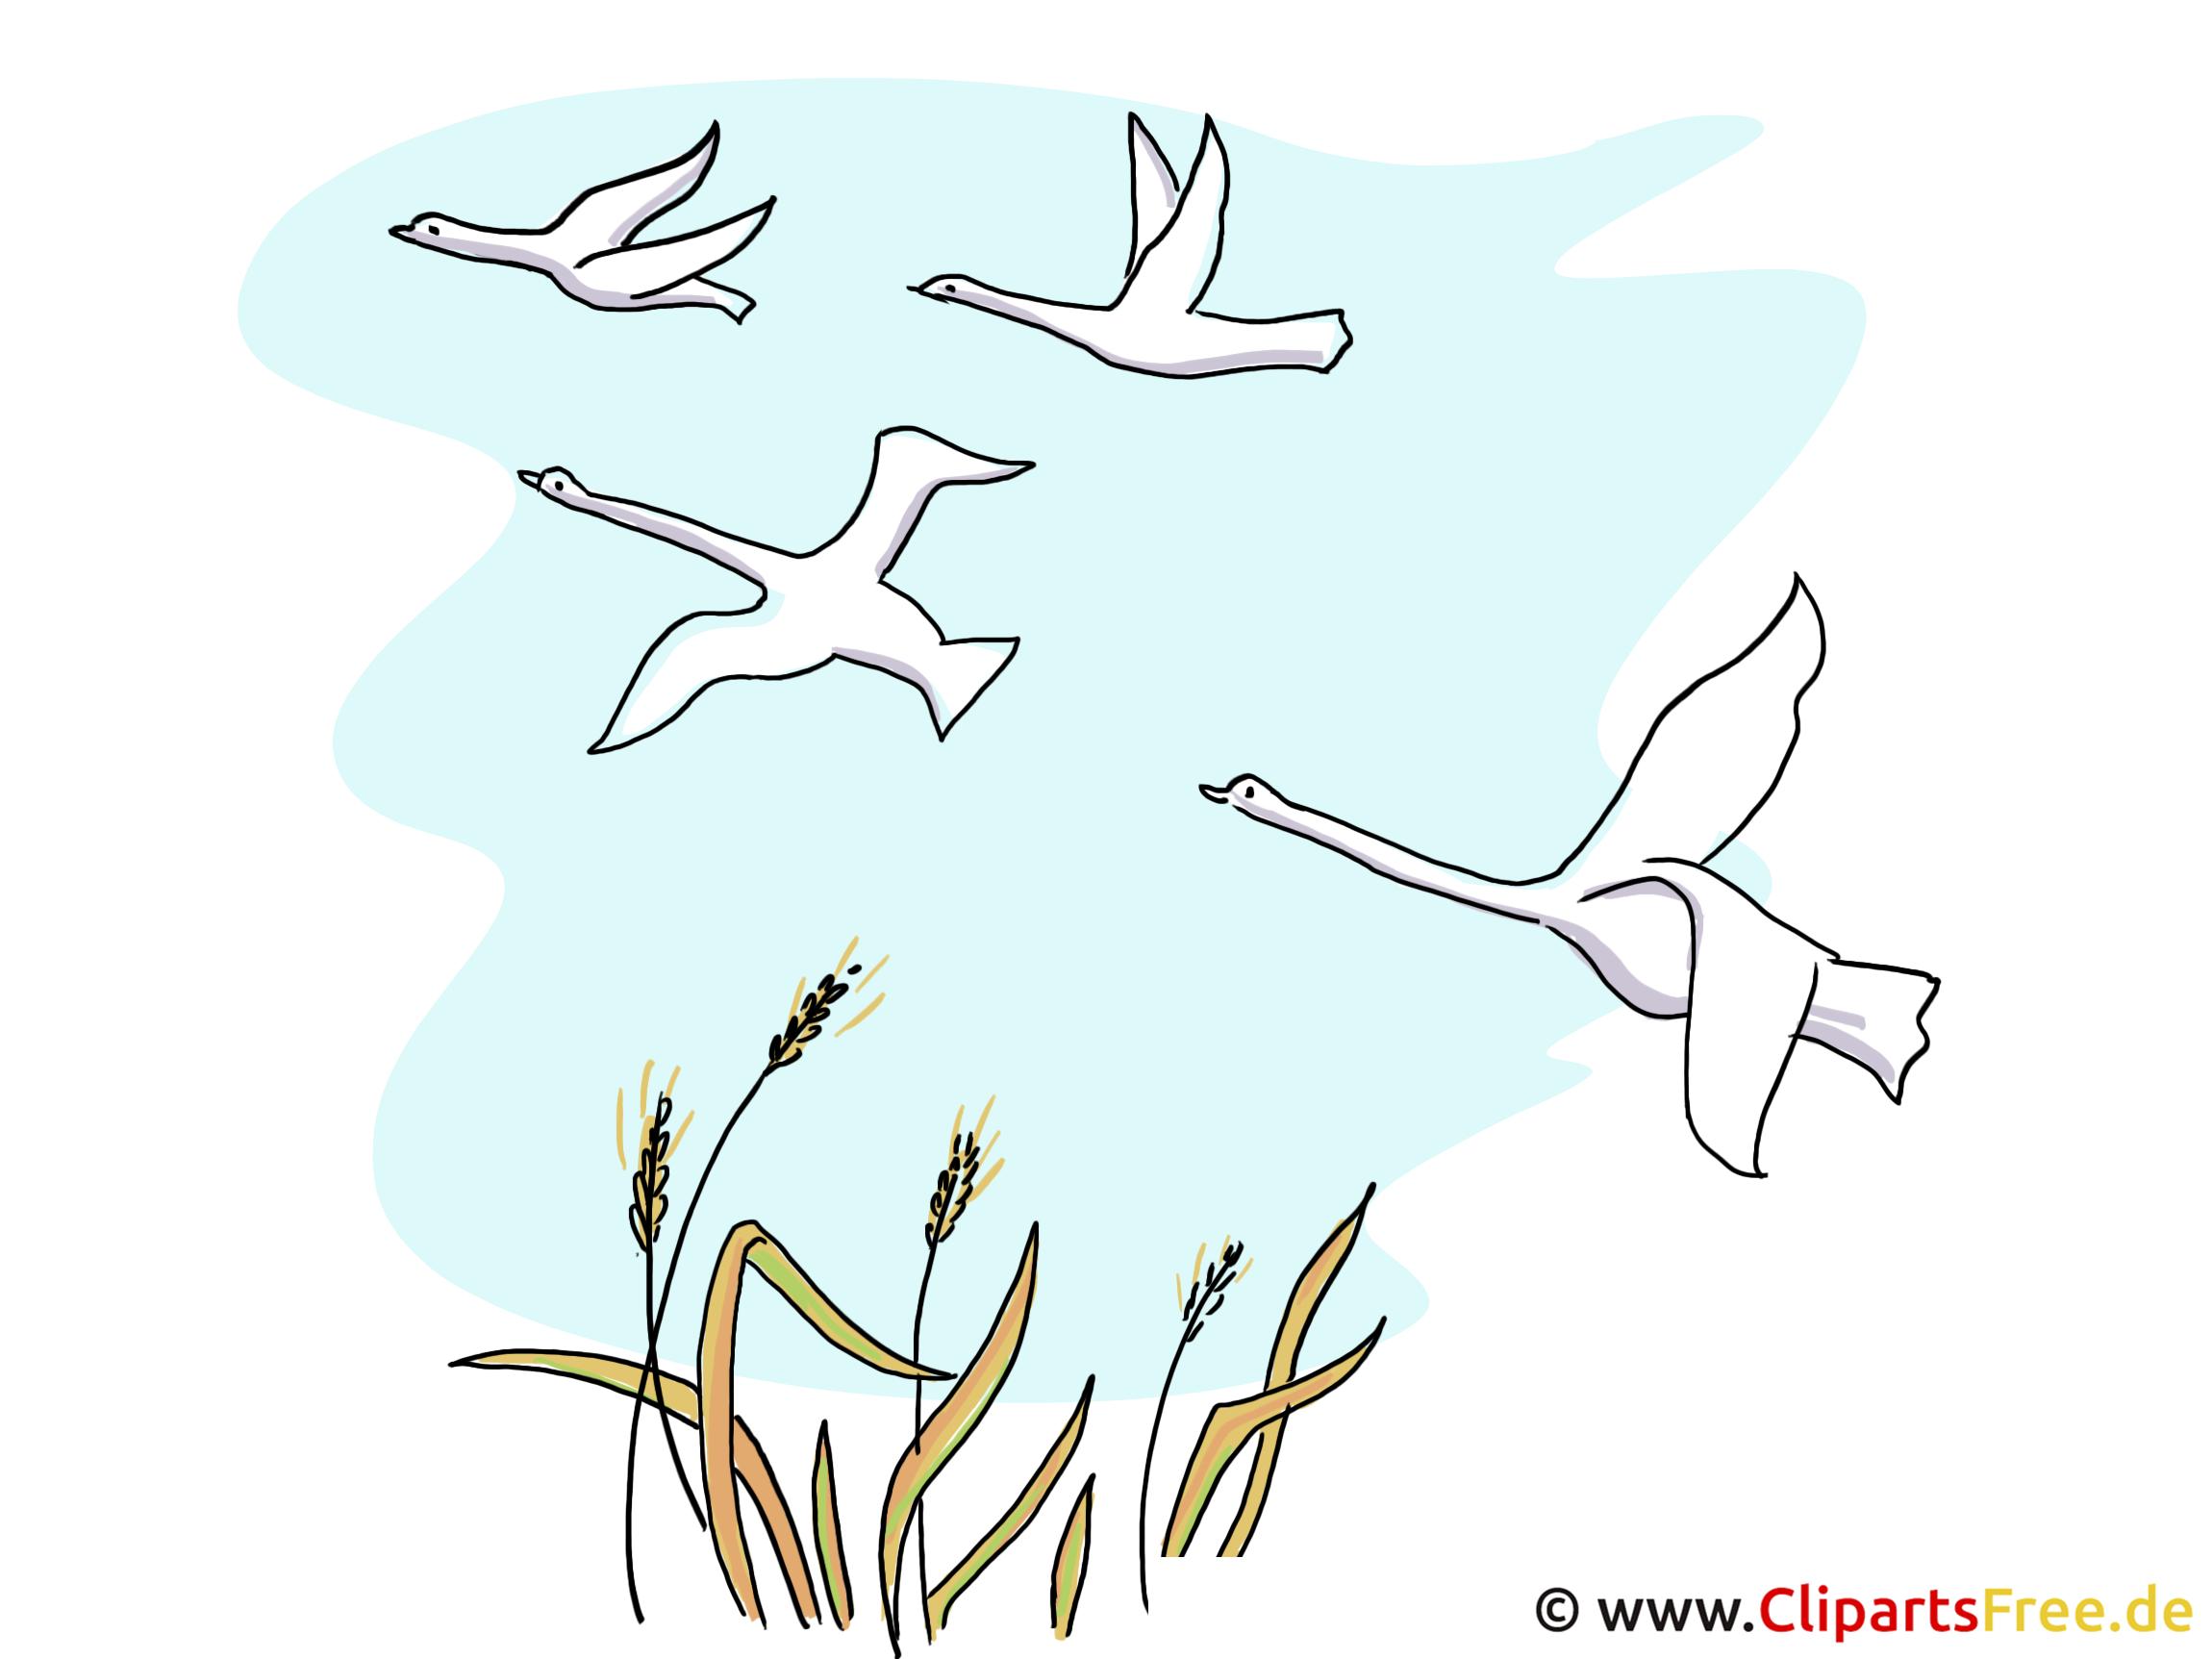 Vogelzug Bild, Clipart, Illustration